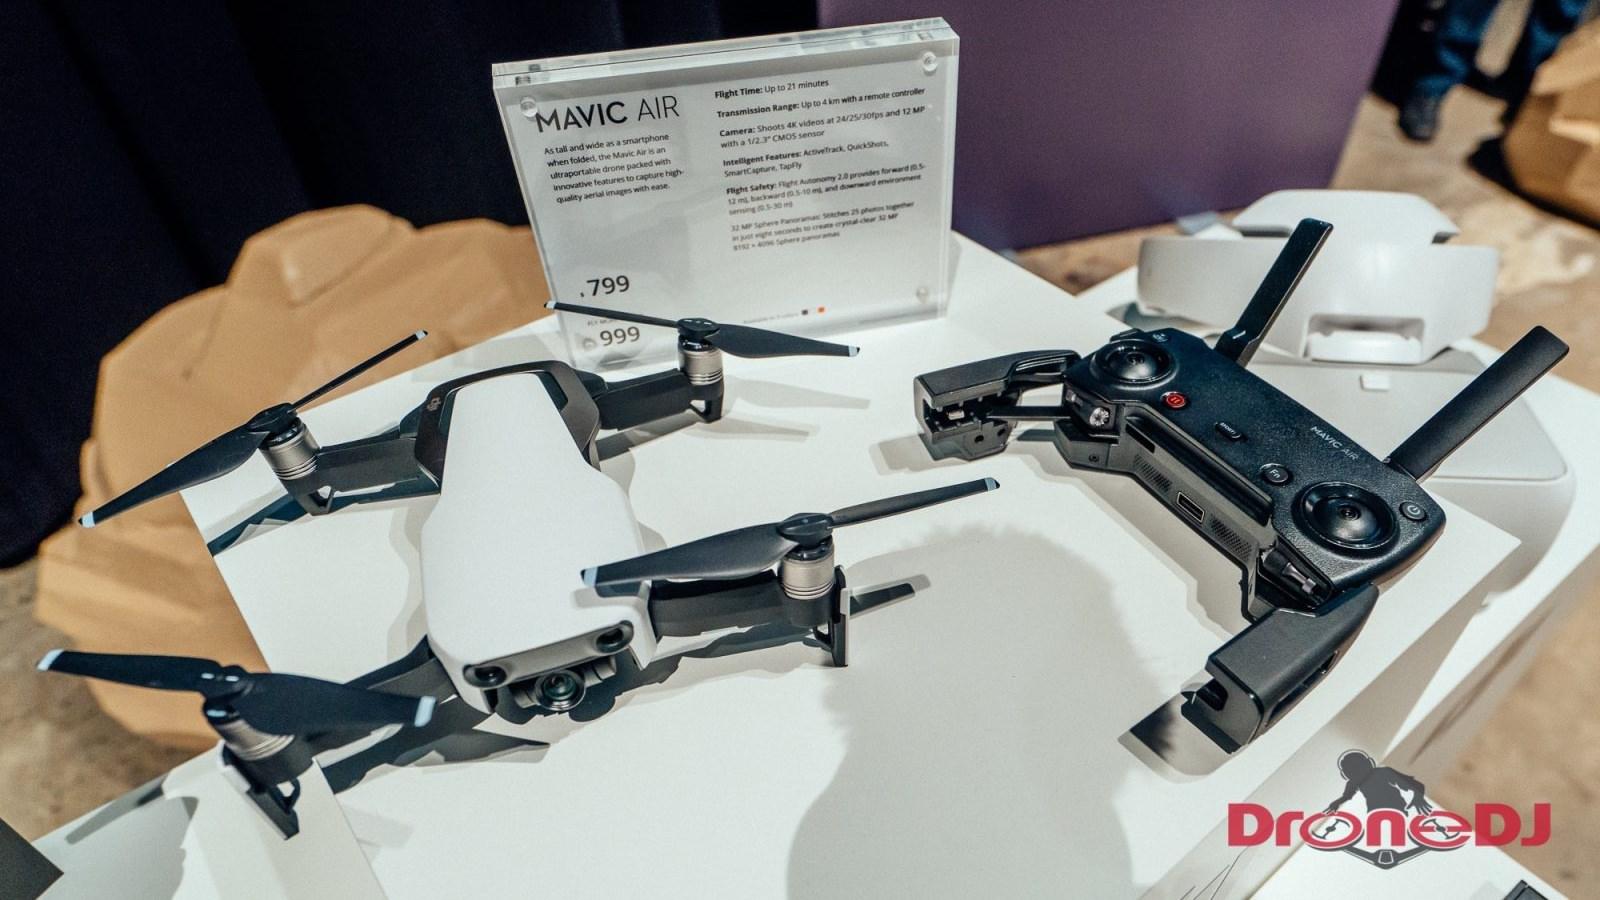 DJI Mavic Air firmware update released - v01 00 0560 - DroneDJ